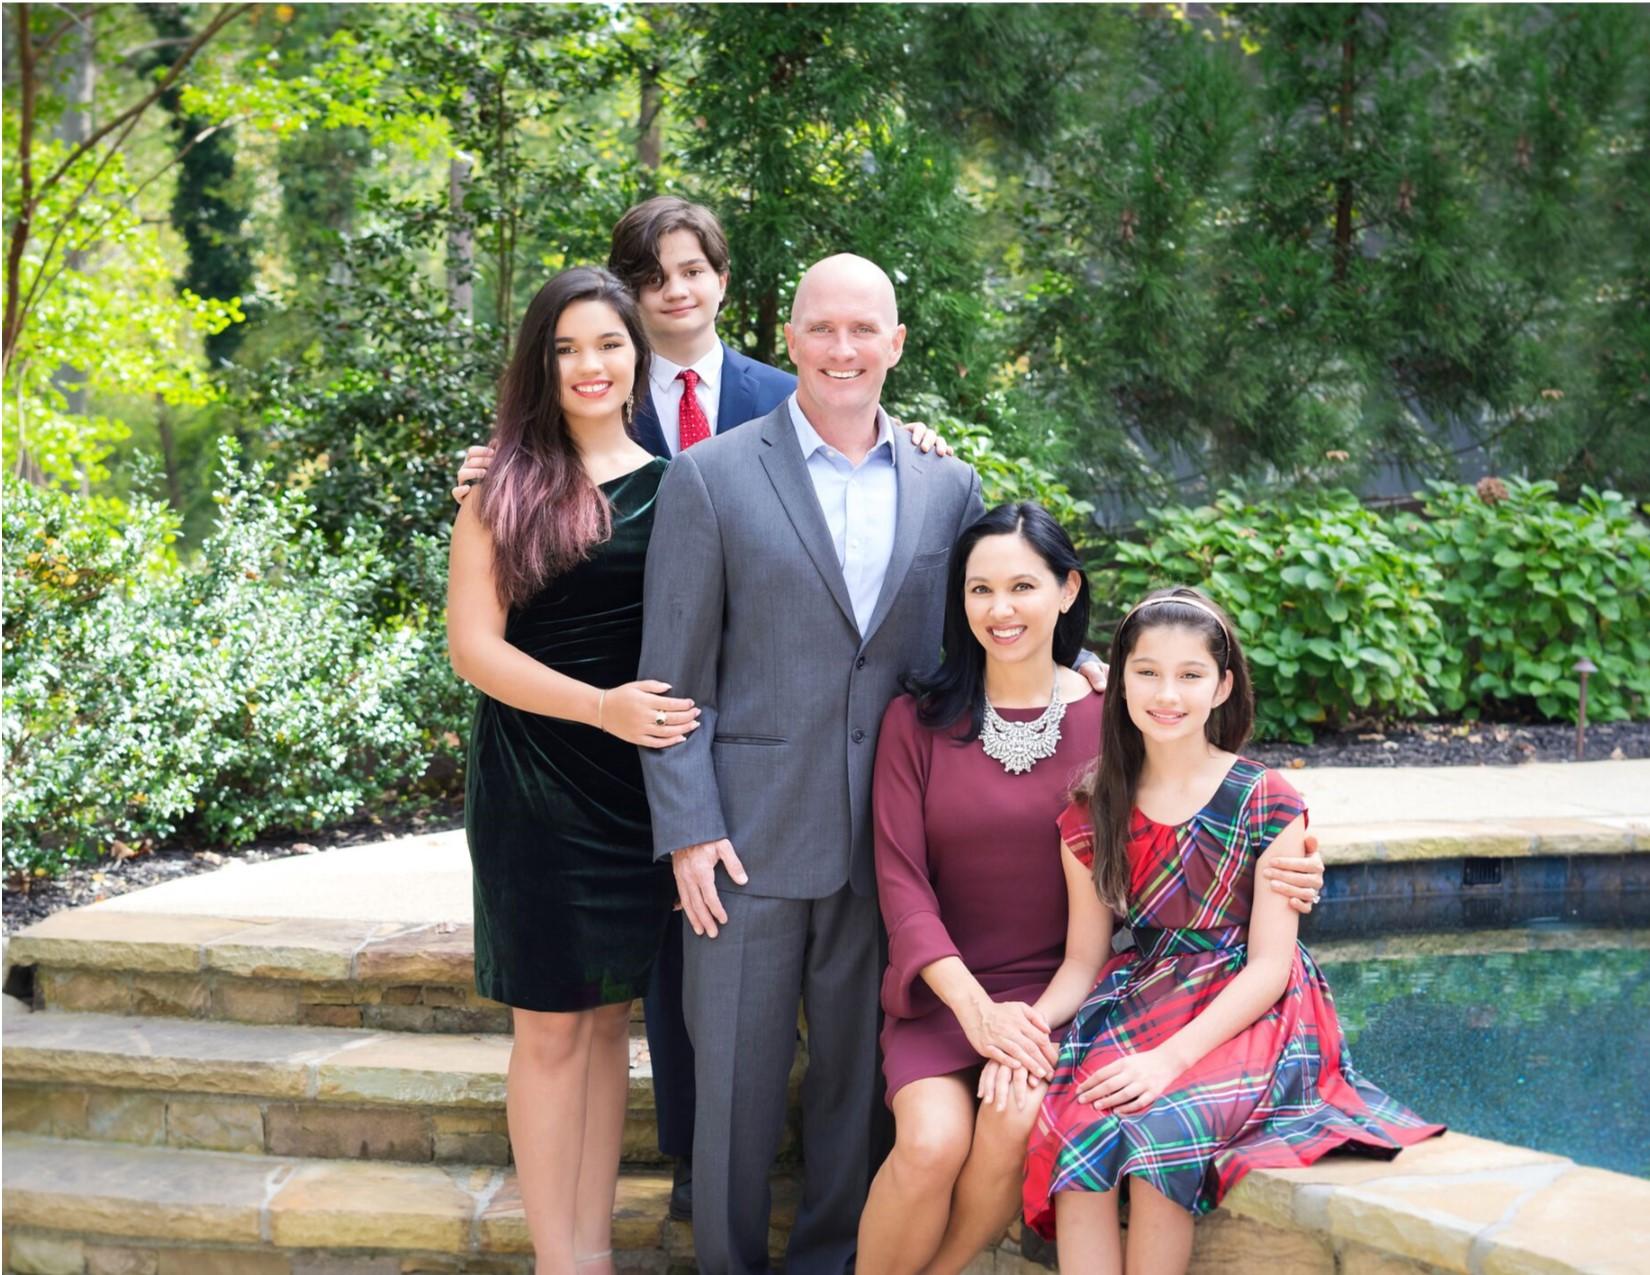 DAUGHERTY, MICHAEL: Family photo Michael Daugherty.jpg